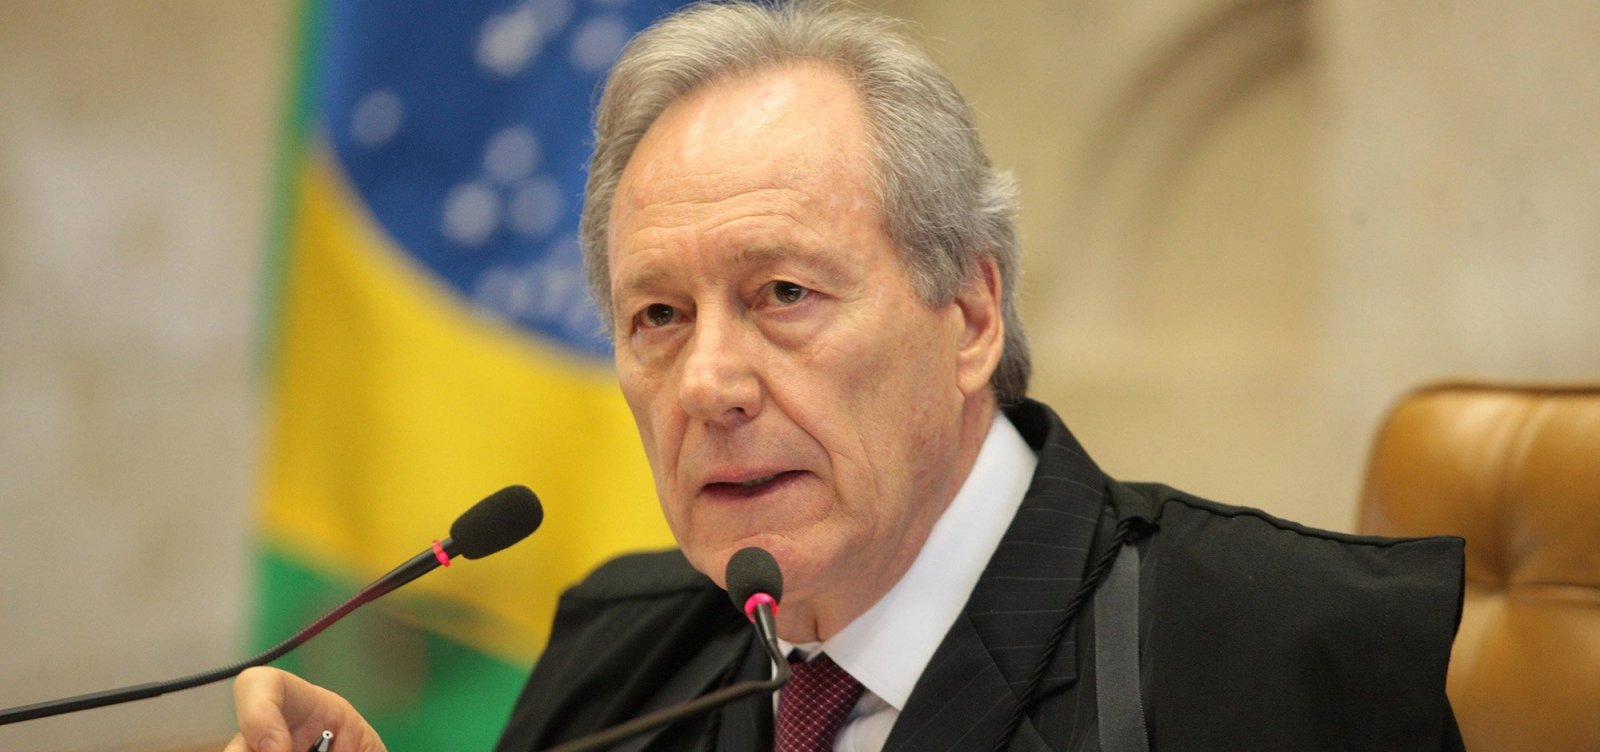 [Lewandowski autoriza imediata entrevista de Lula à Folha]